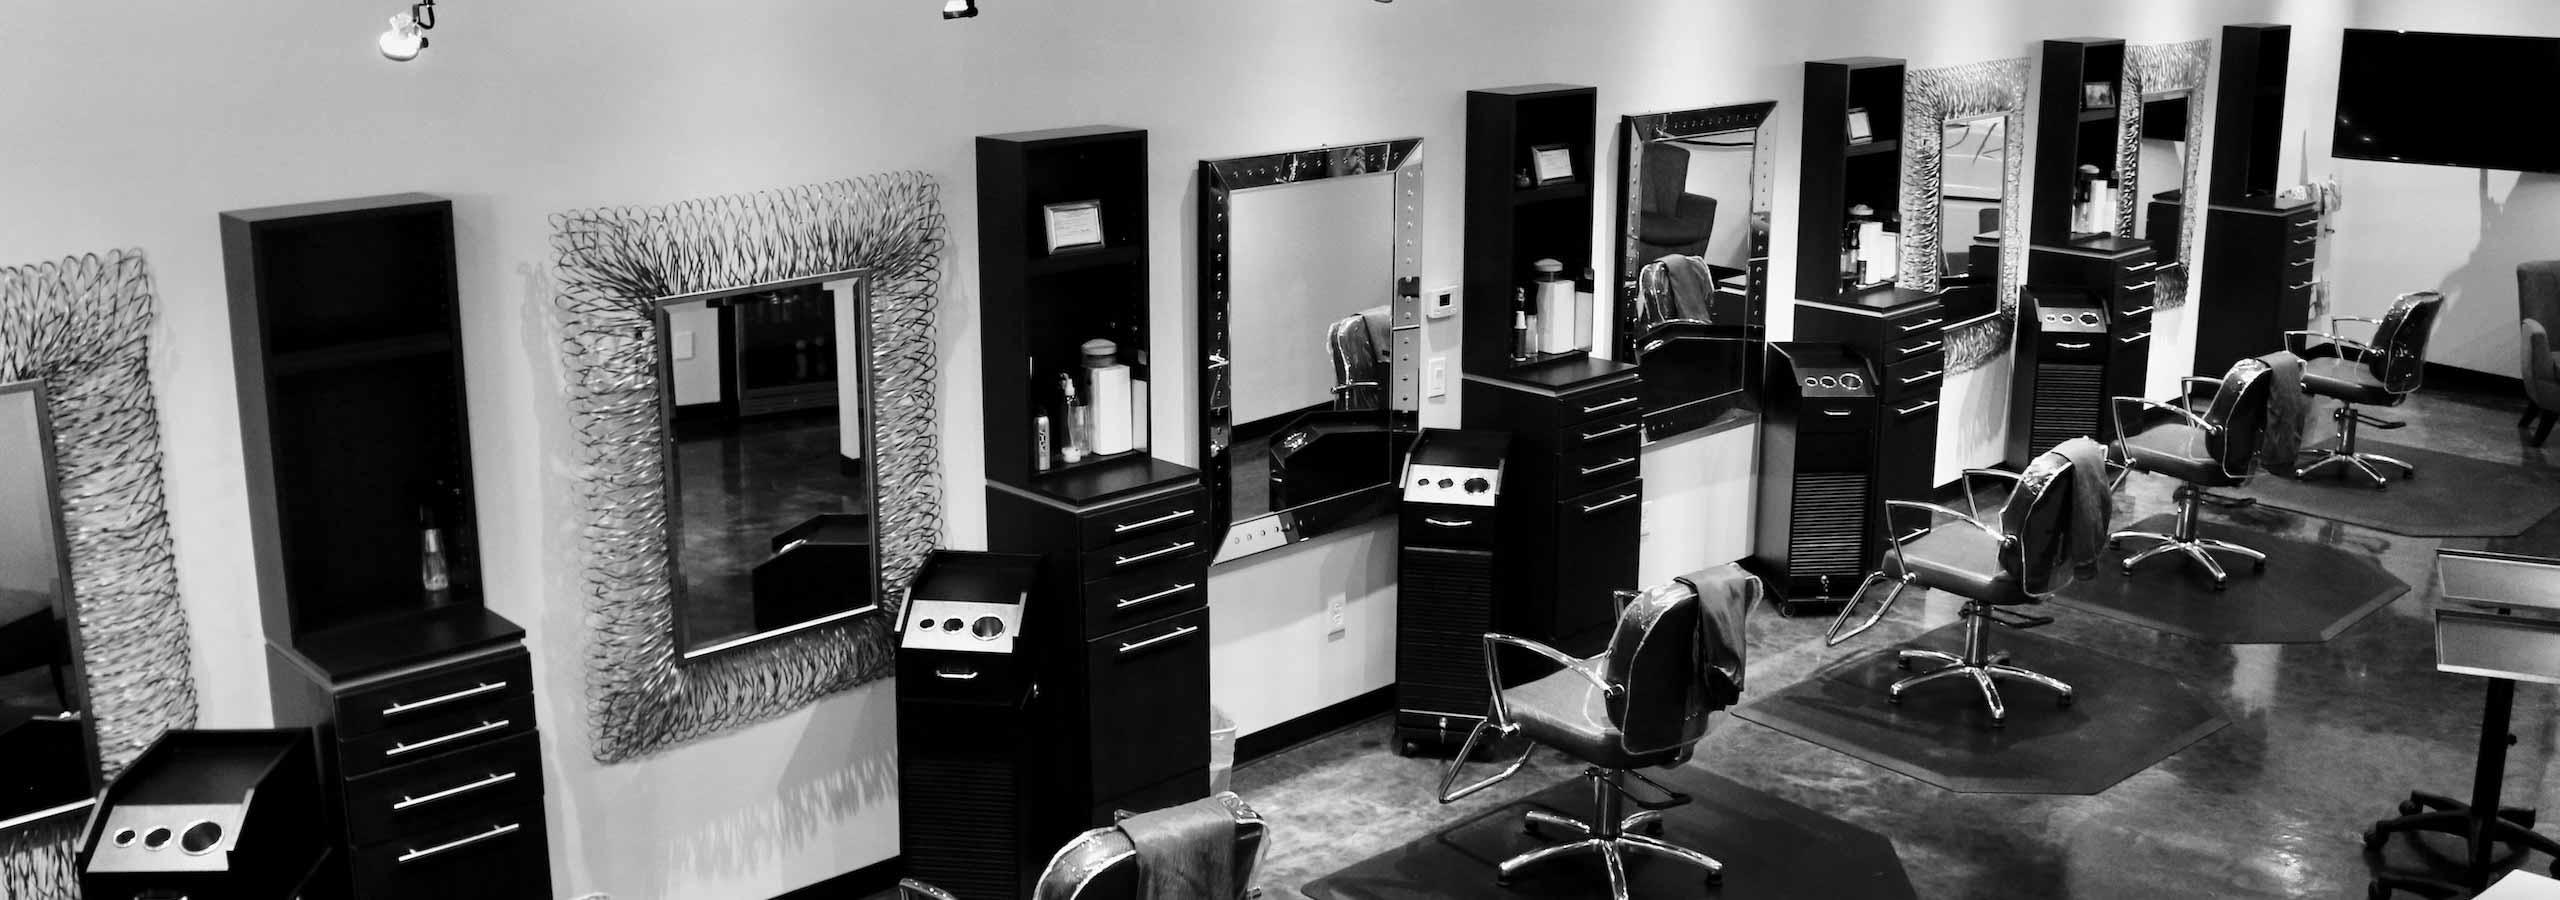 Contemporary remodel at Design Ramon Hair Studio in Ahwatukee   480 763 5588